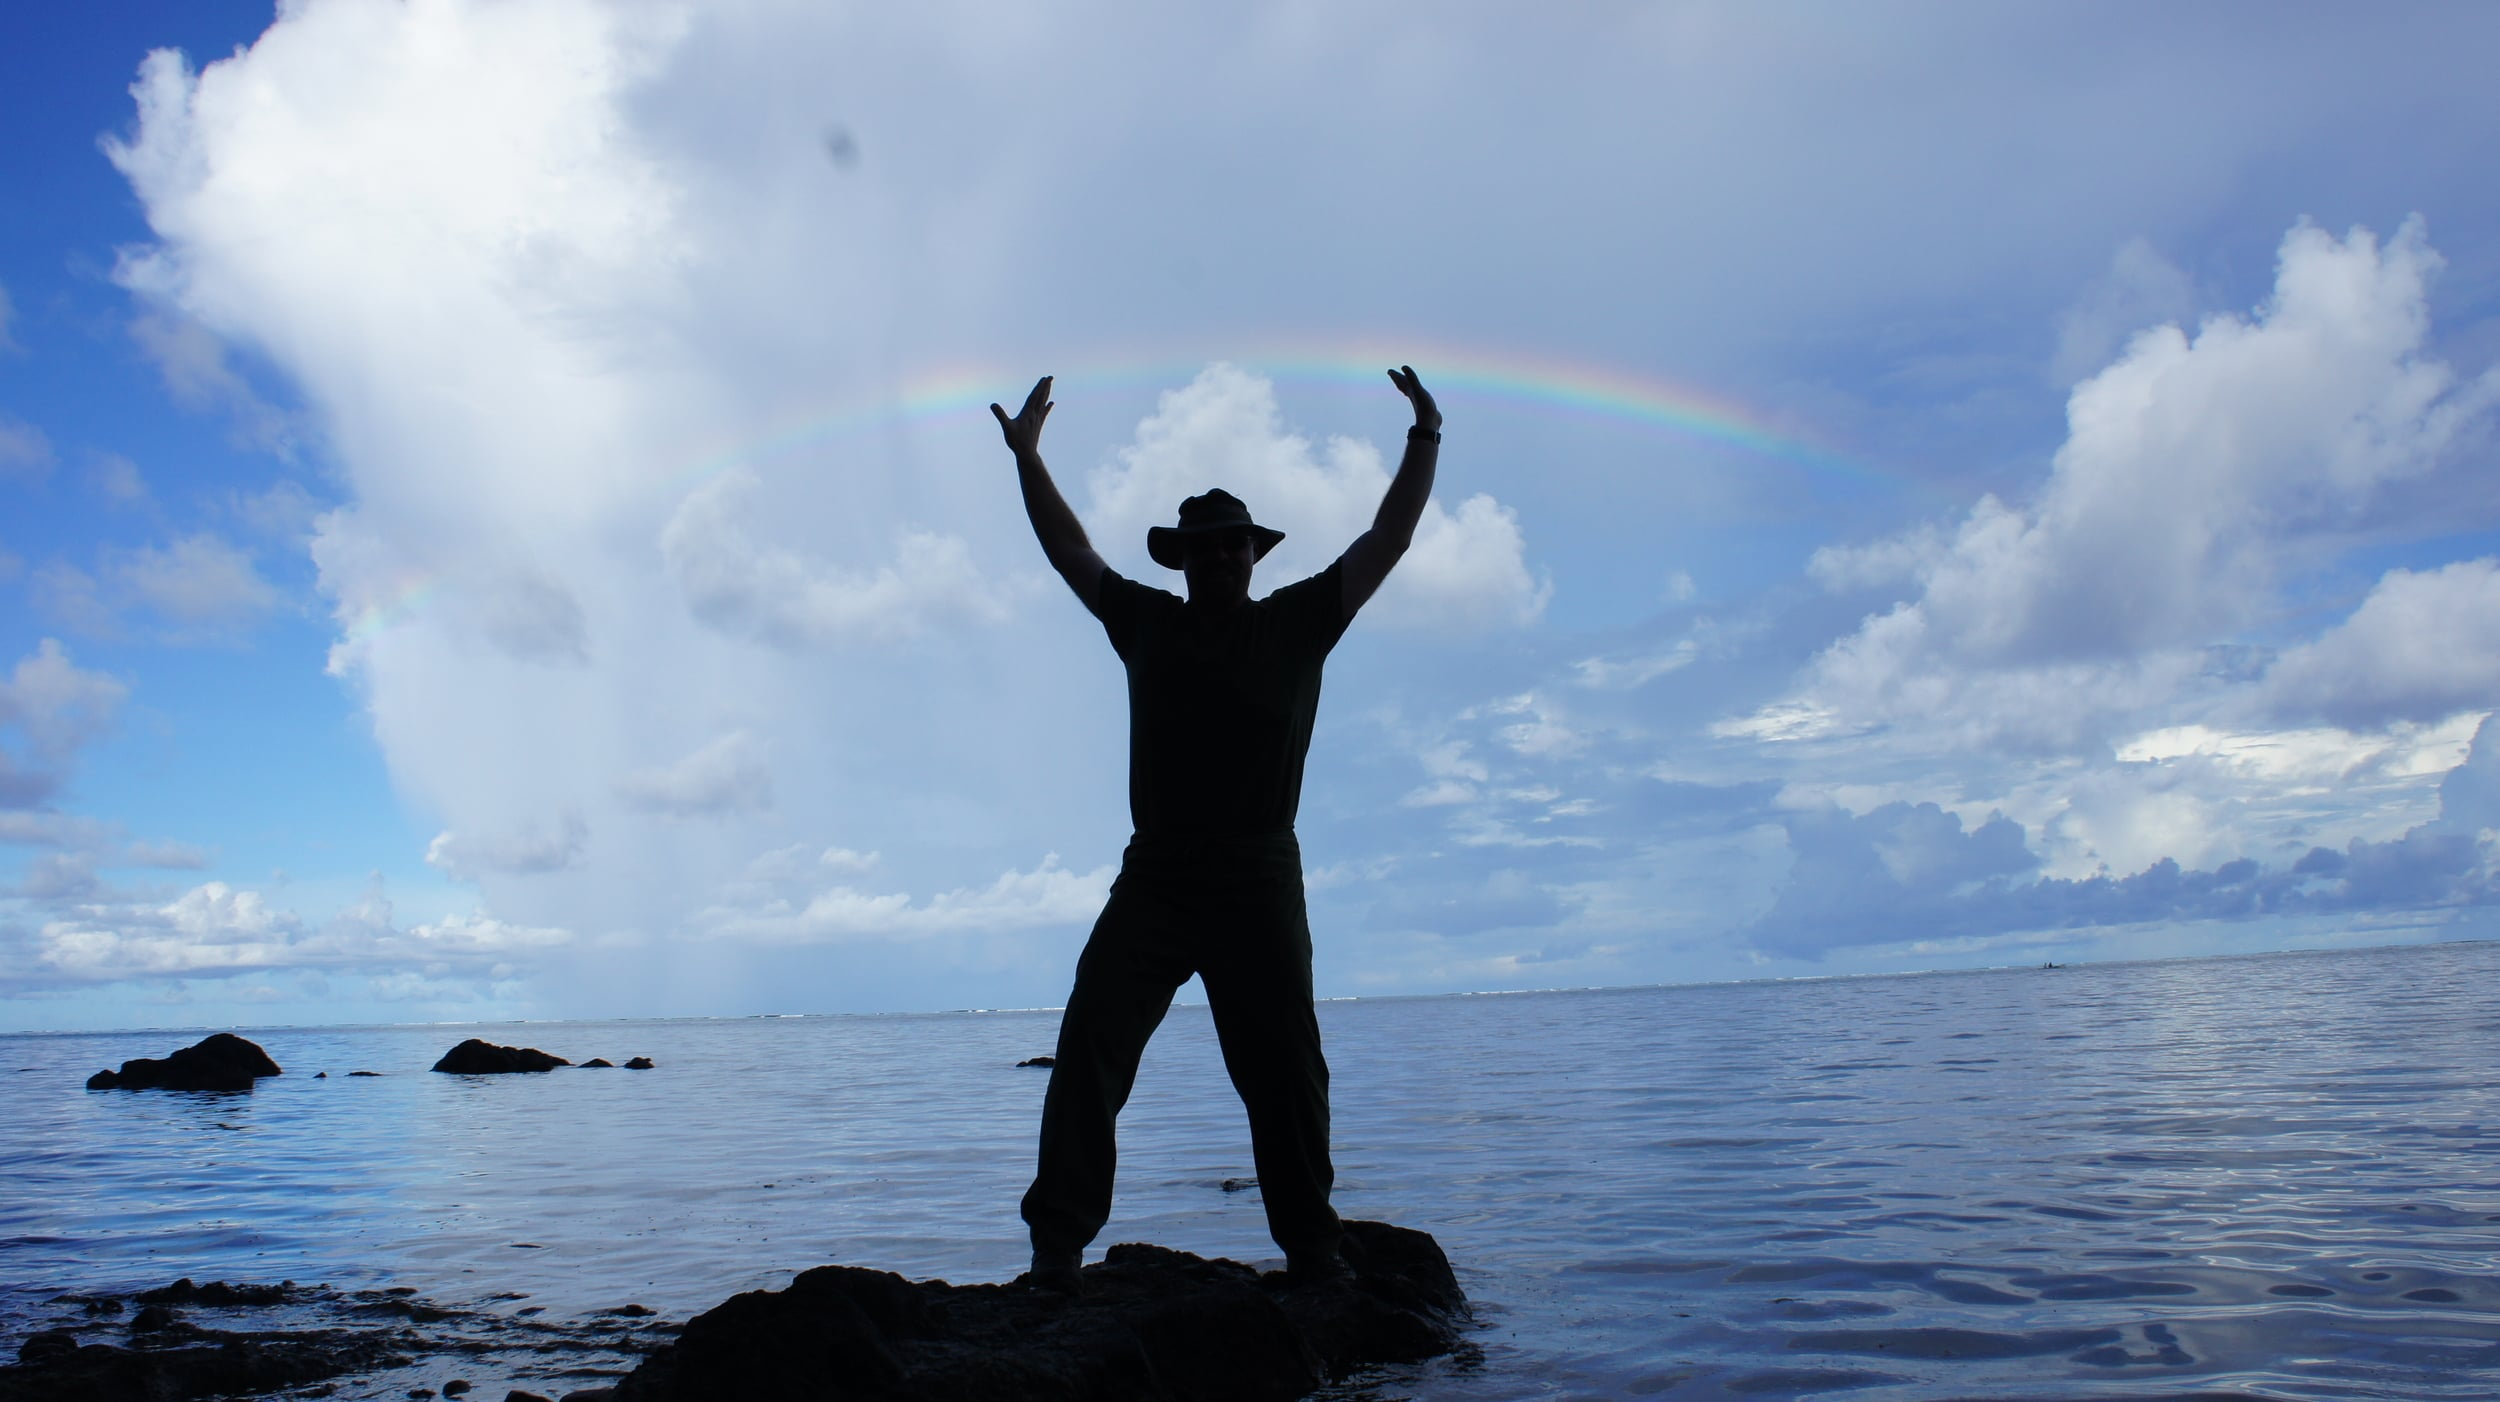 Work hard, play hard on Yap, Federated States of Micronesia